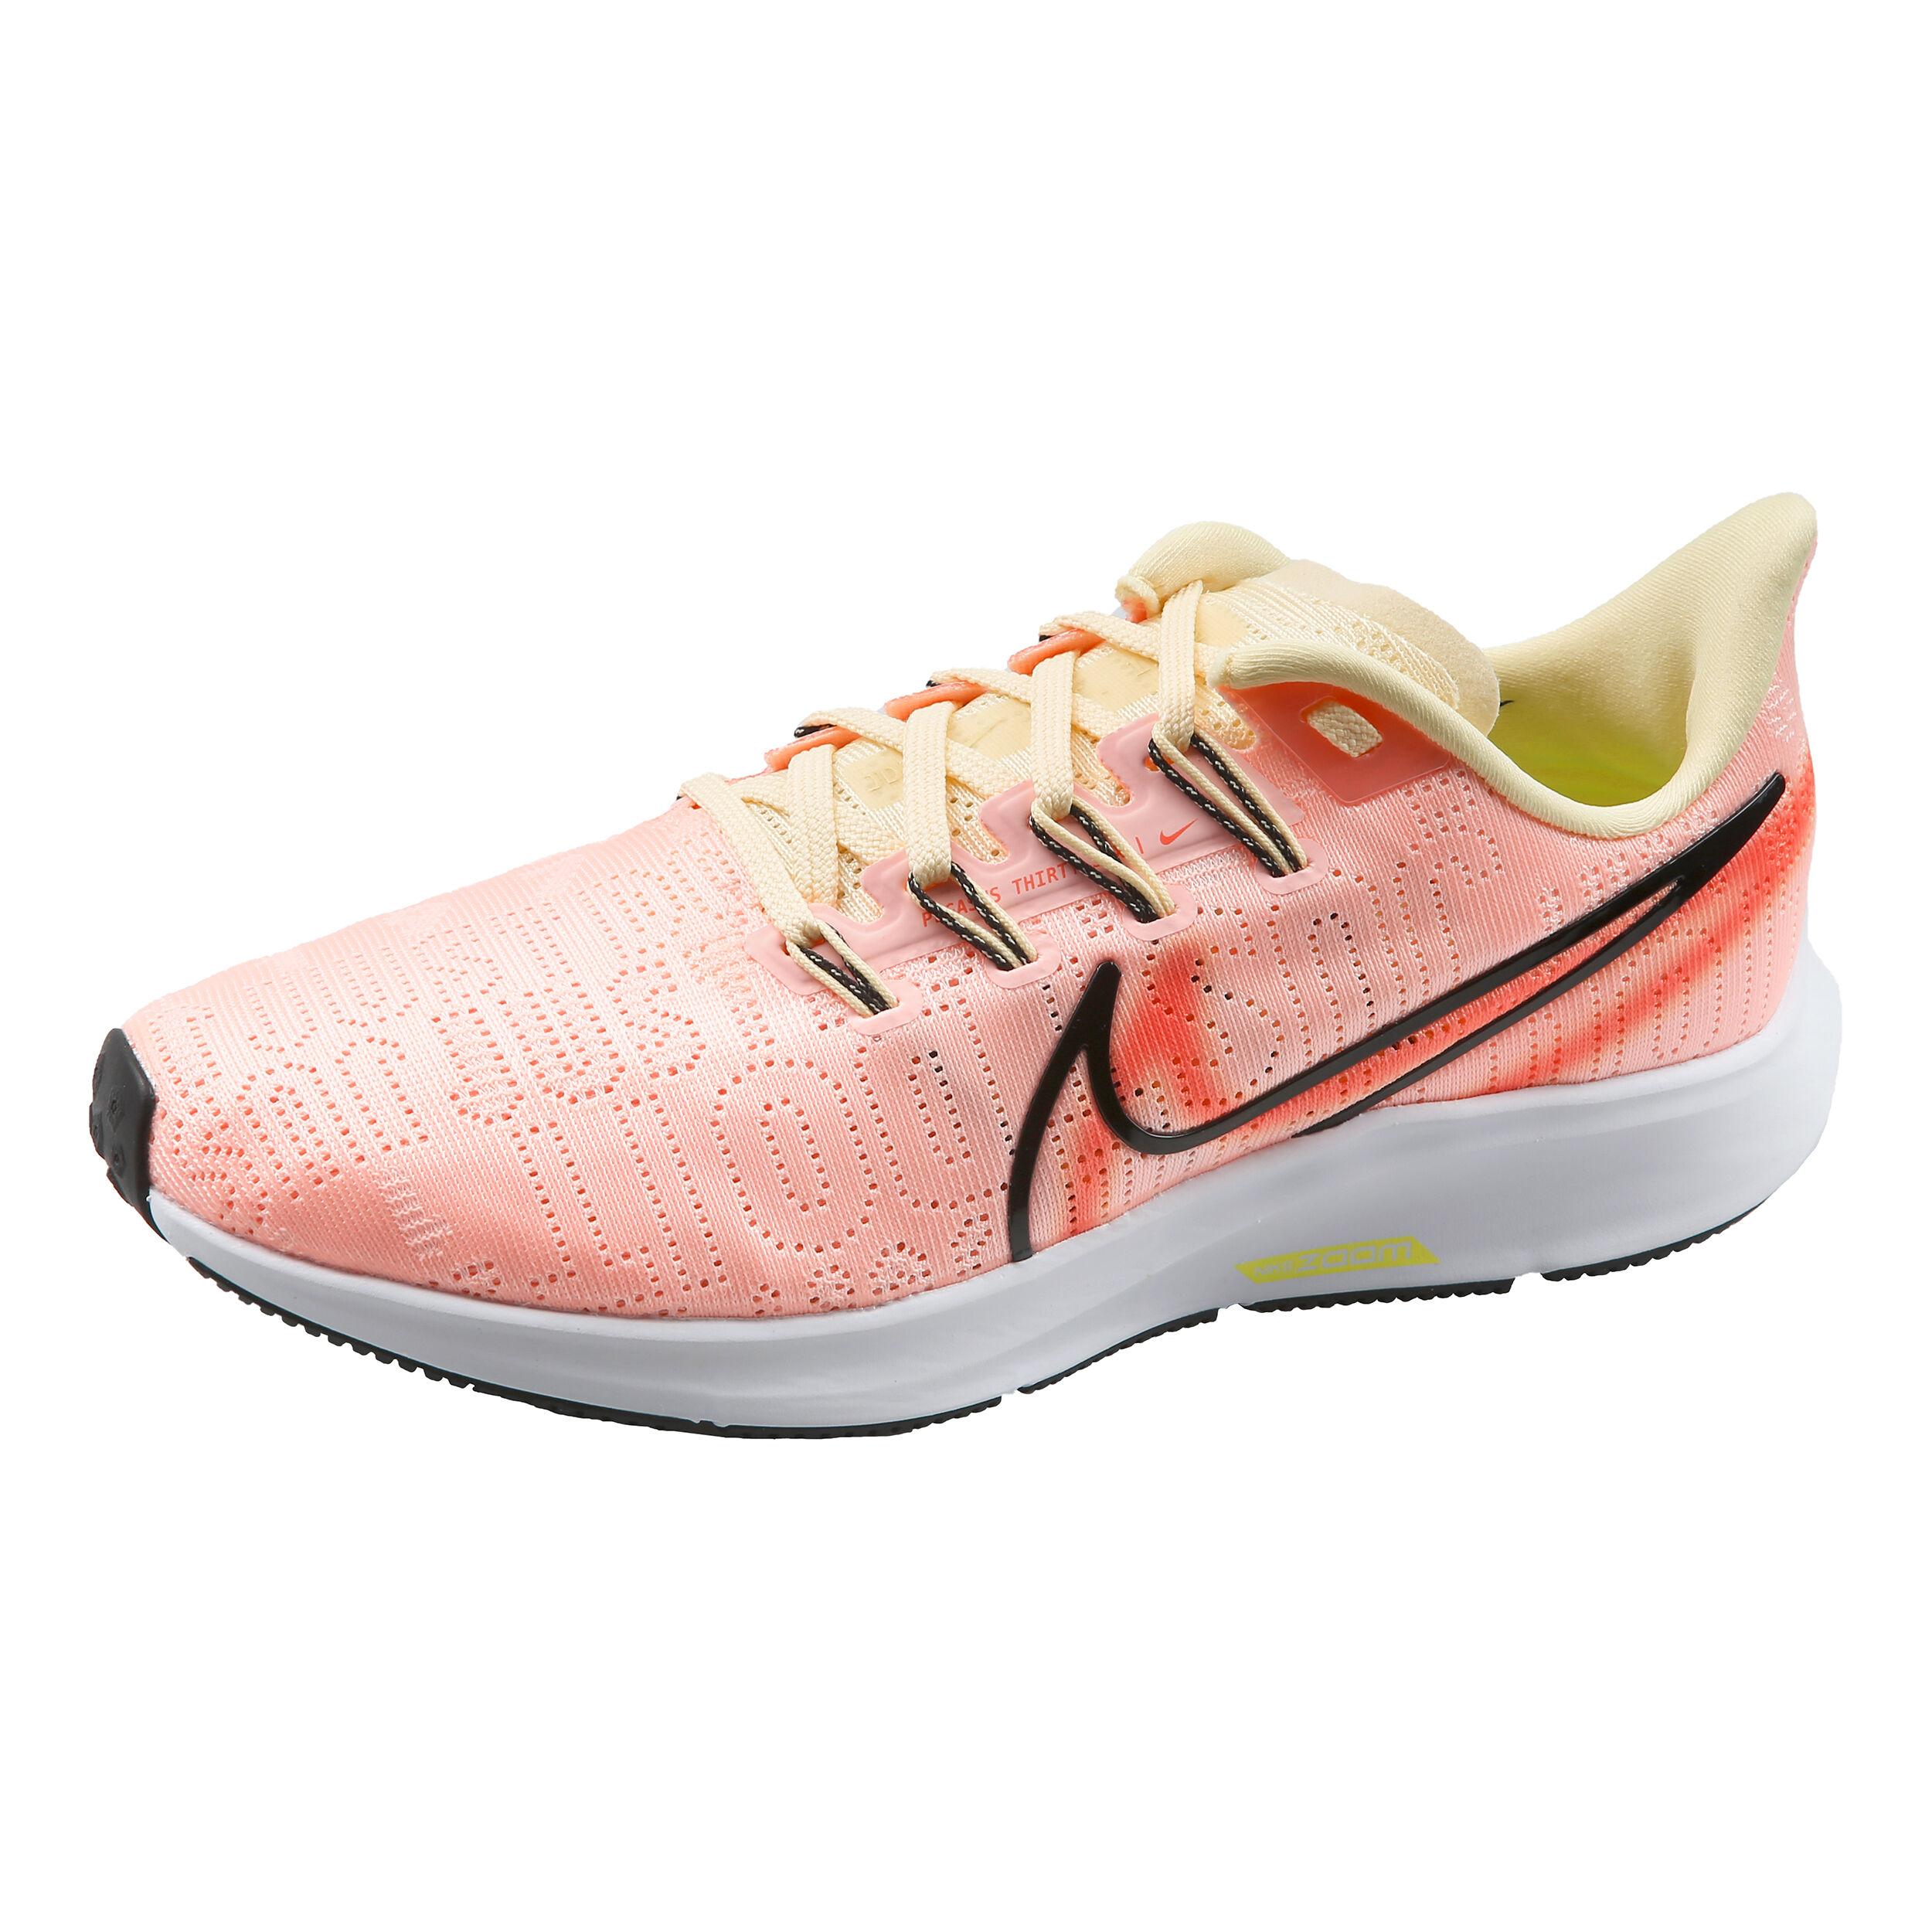 Nike Pegasus Air Zoom 36 Premium Rise Neutralschuh Damen Apricot, Limette